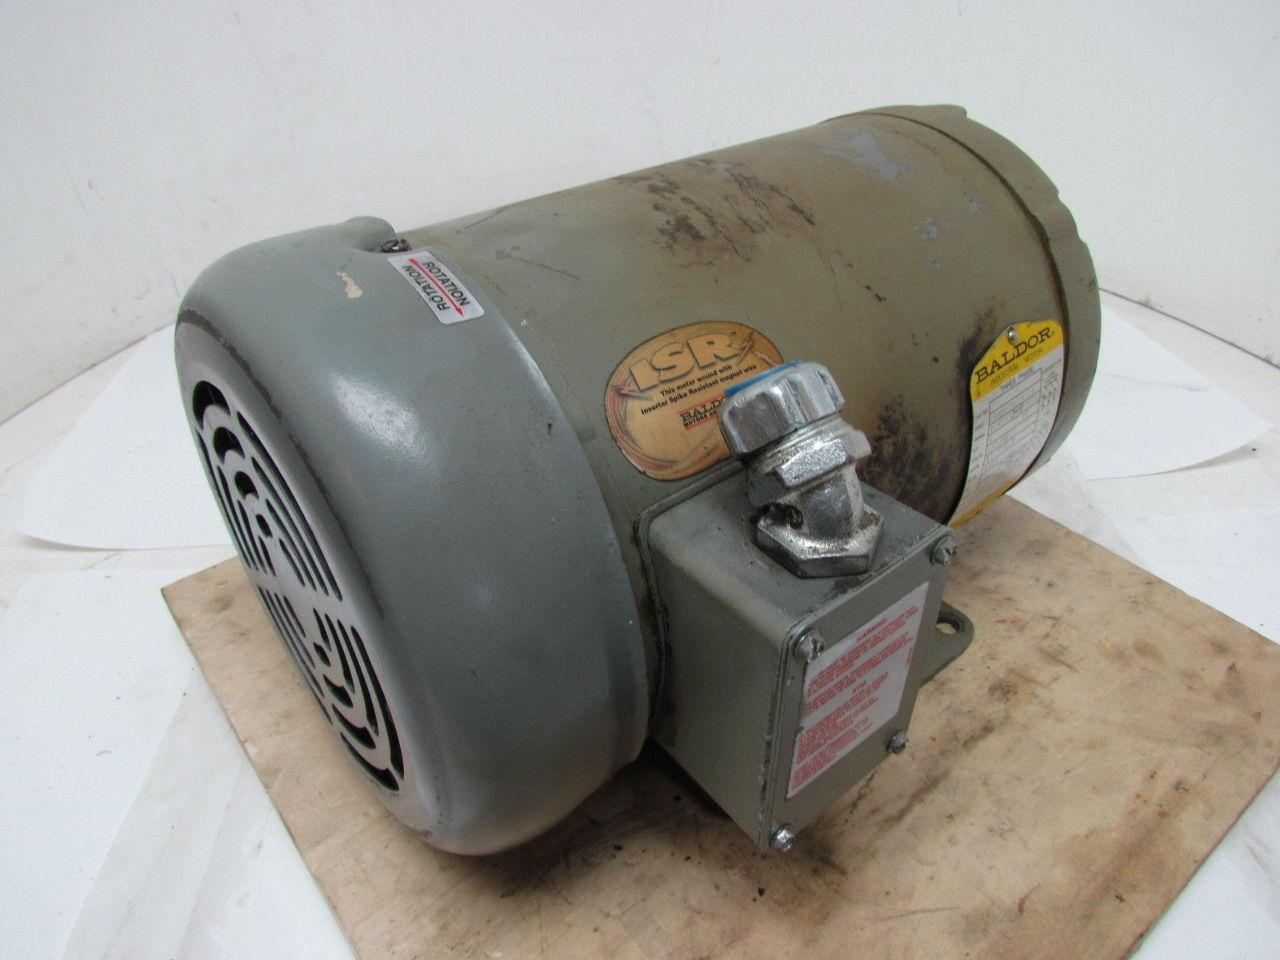 Baldor f898 5 hp 230 460v 1725 rpm 3 ph electric motor for 5 hp tefc motor